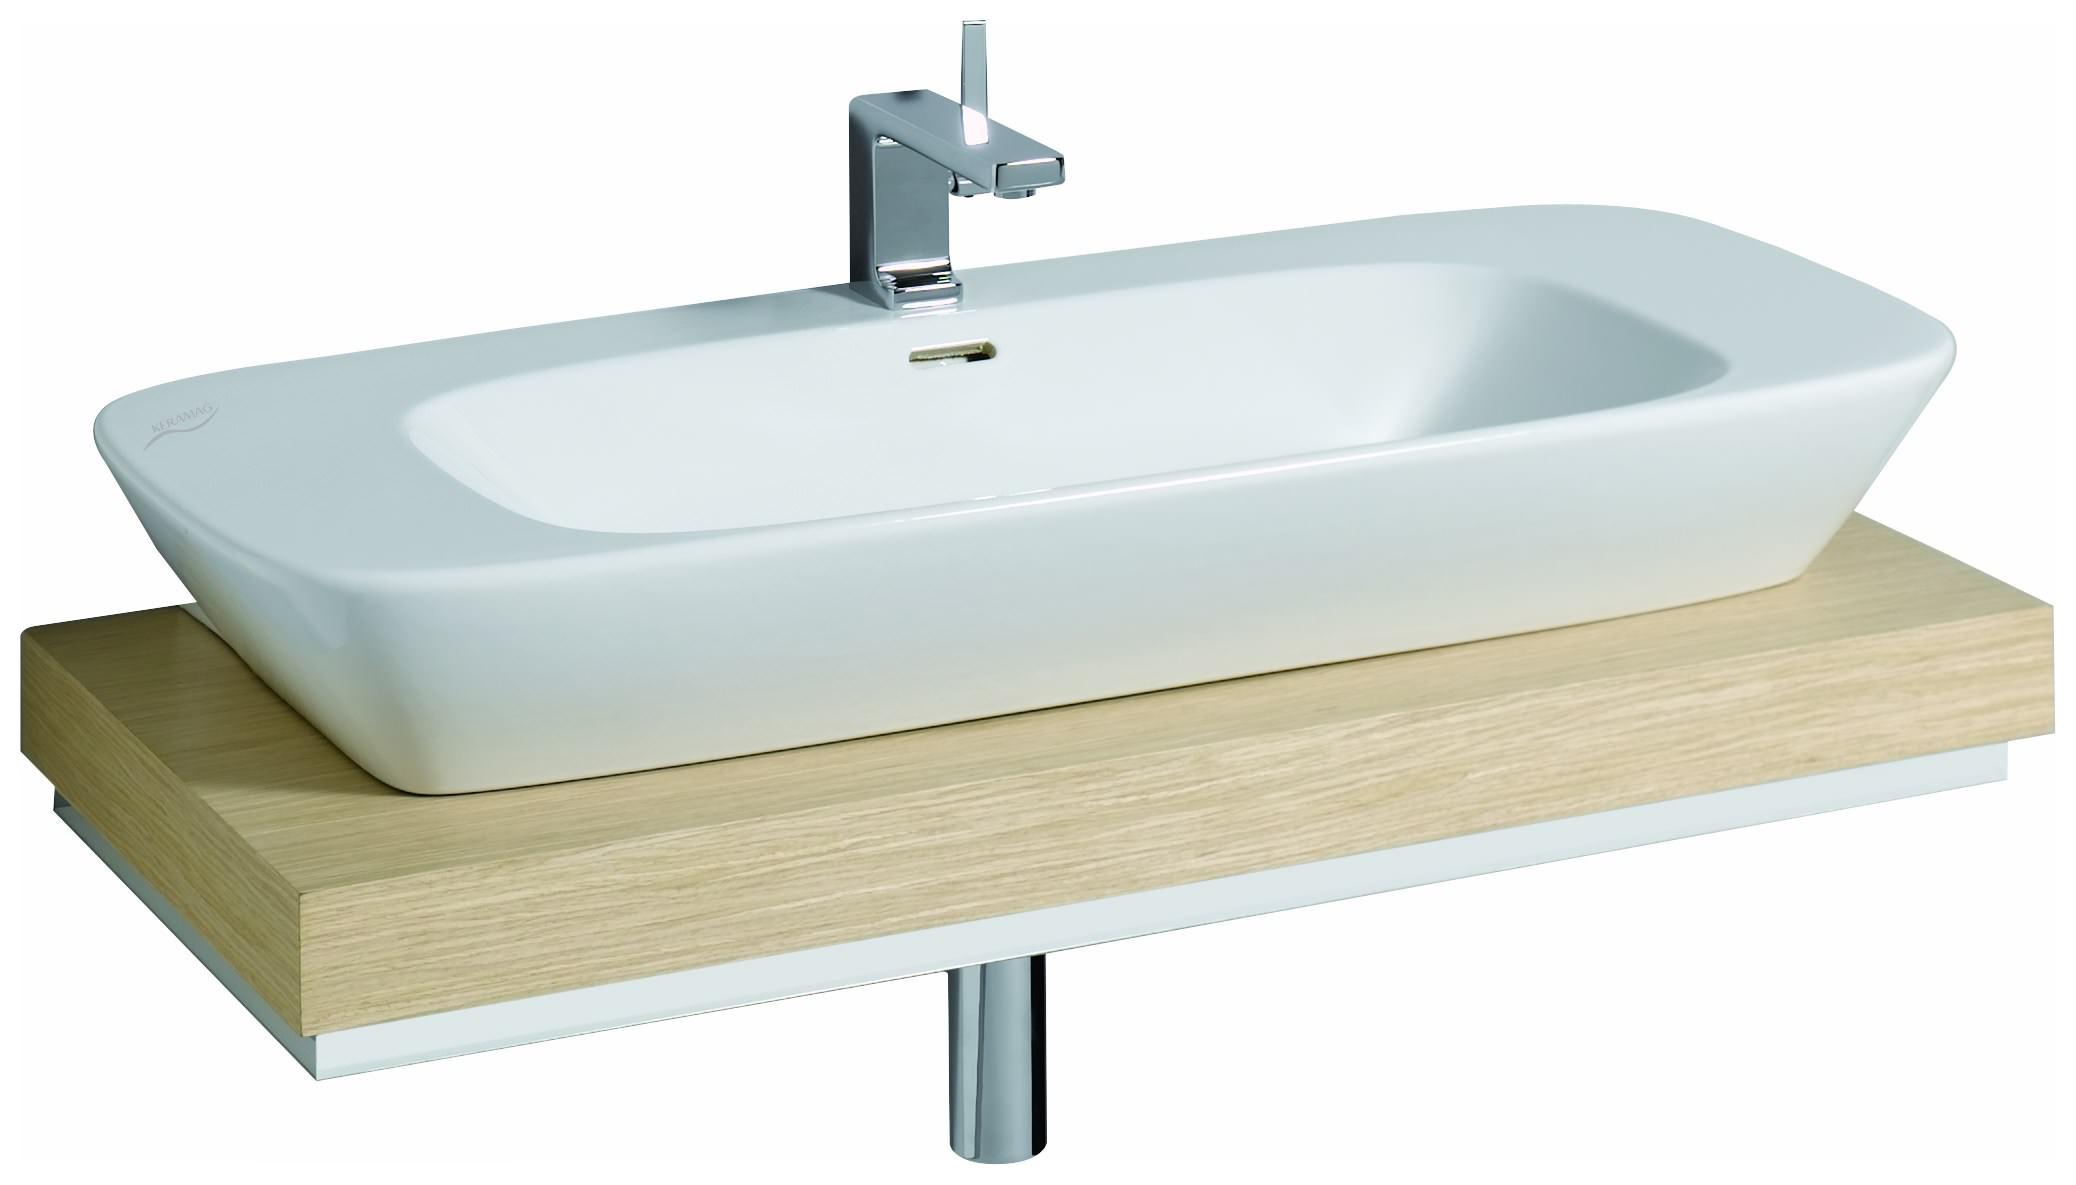 keramag silk waschtisch 121600 1000mm x 470mm wei alpin. Black Bedroom Furniture Sets. Home Design Ideas